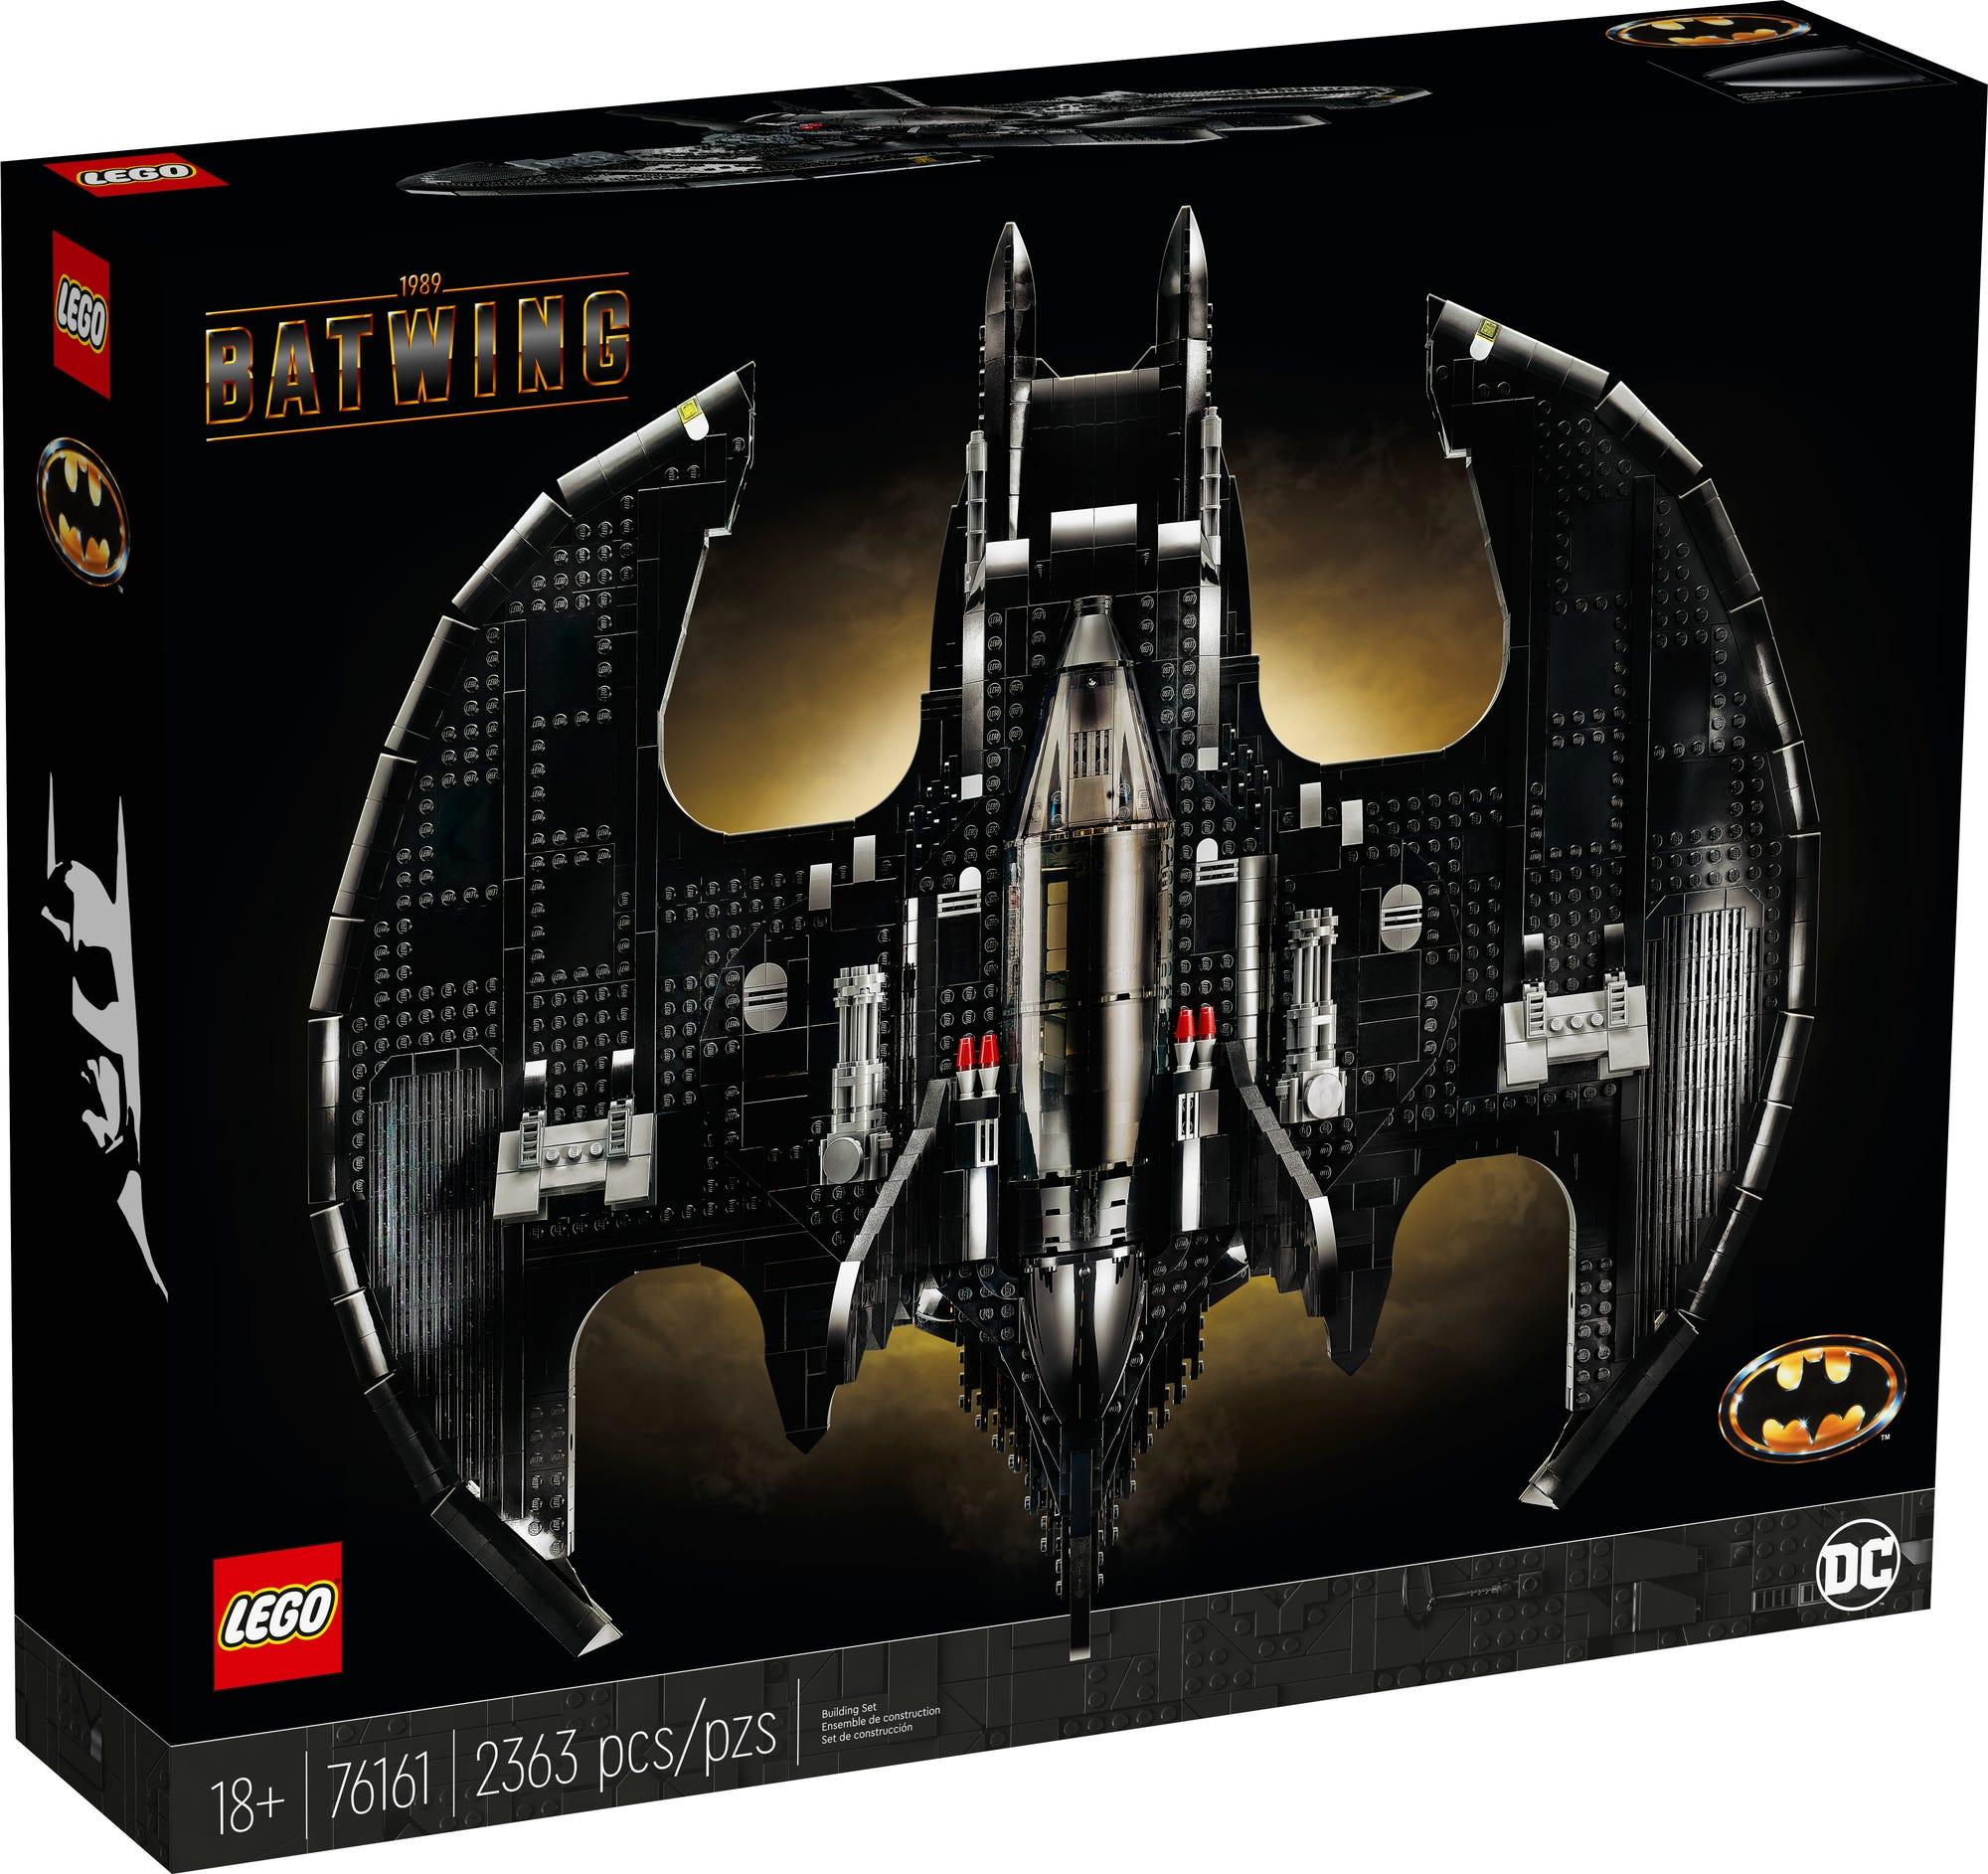 LEGO DC Batman 76161 Batwing 1989